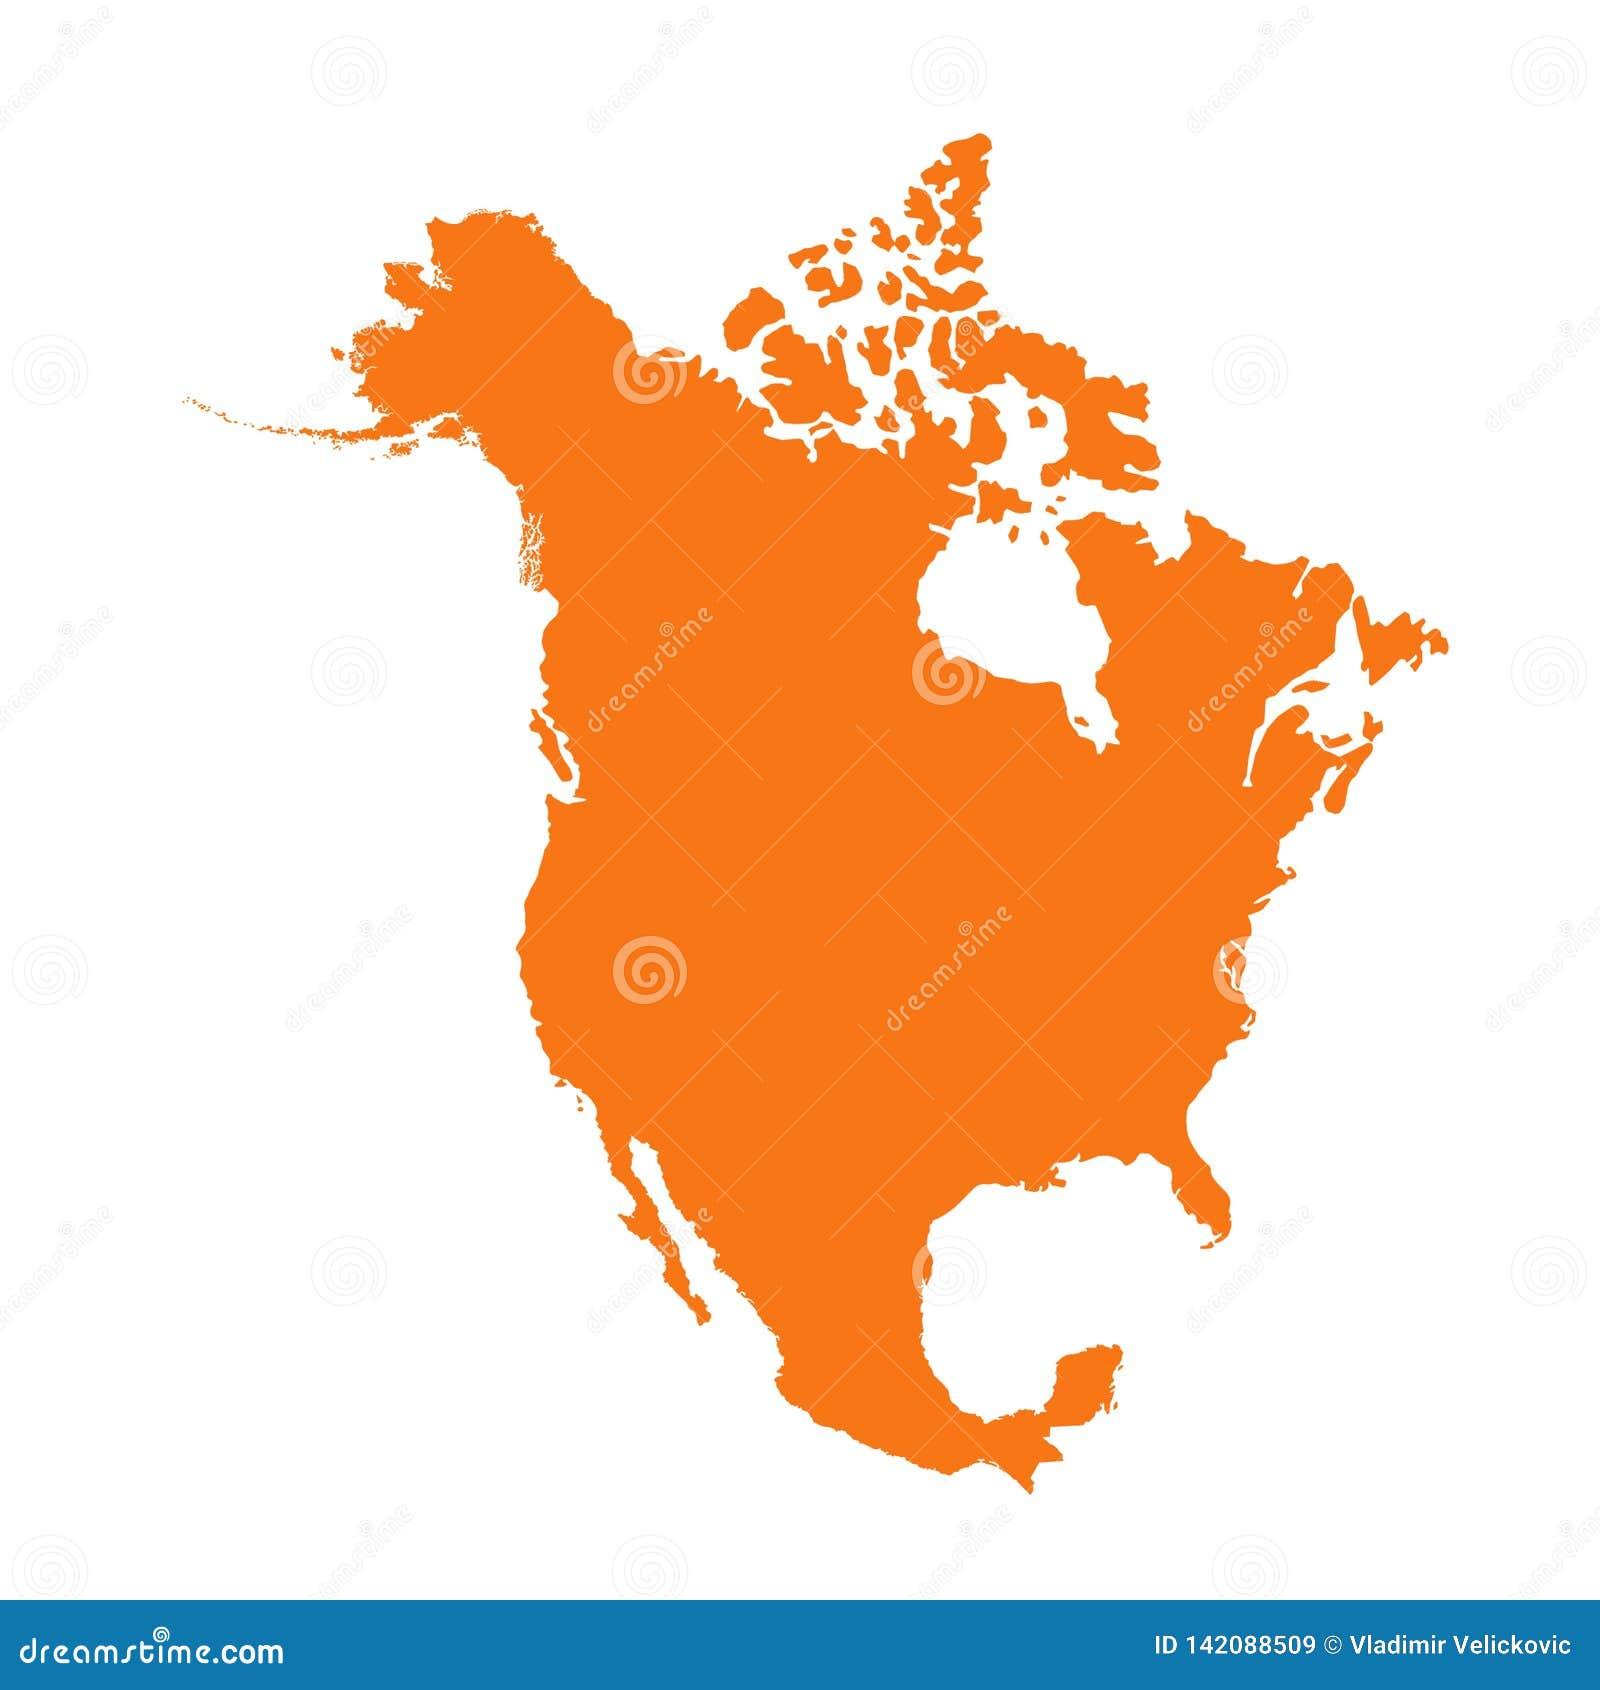 Nordamerika översikt - kontinent